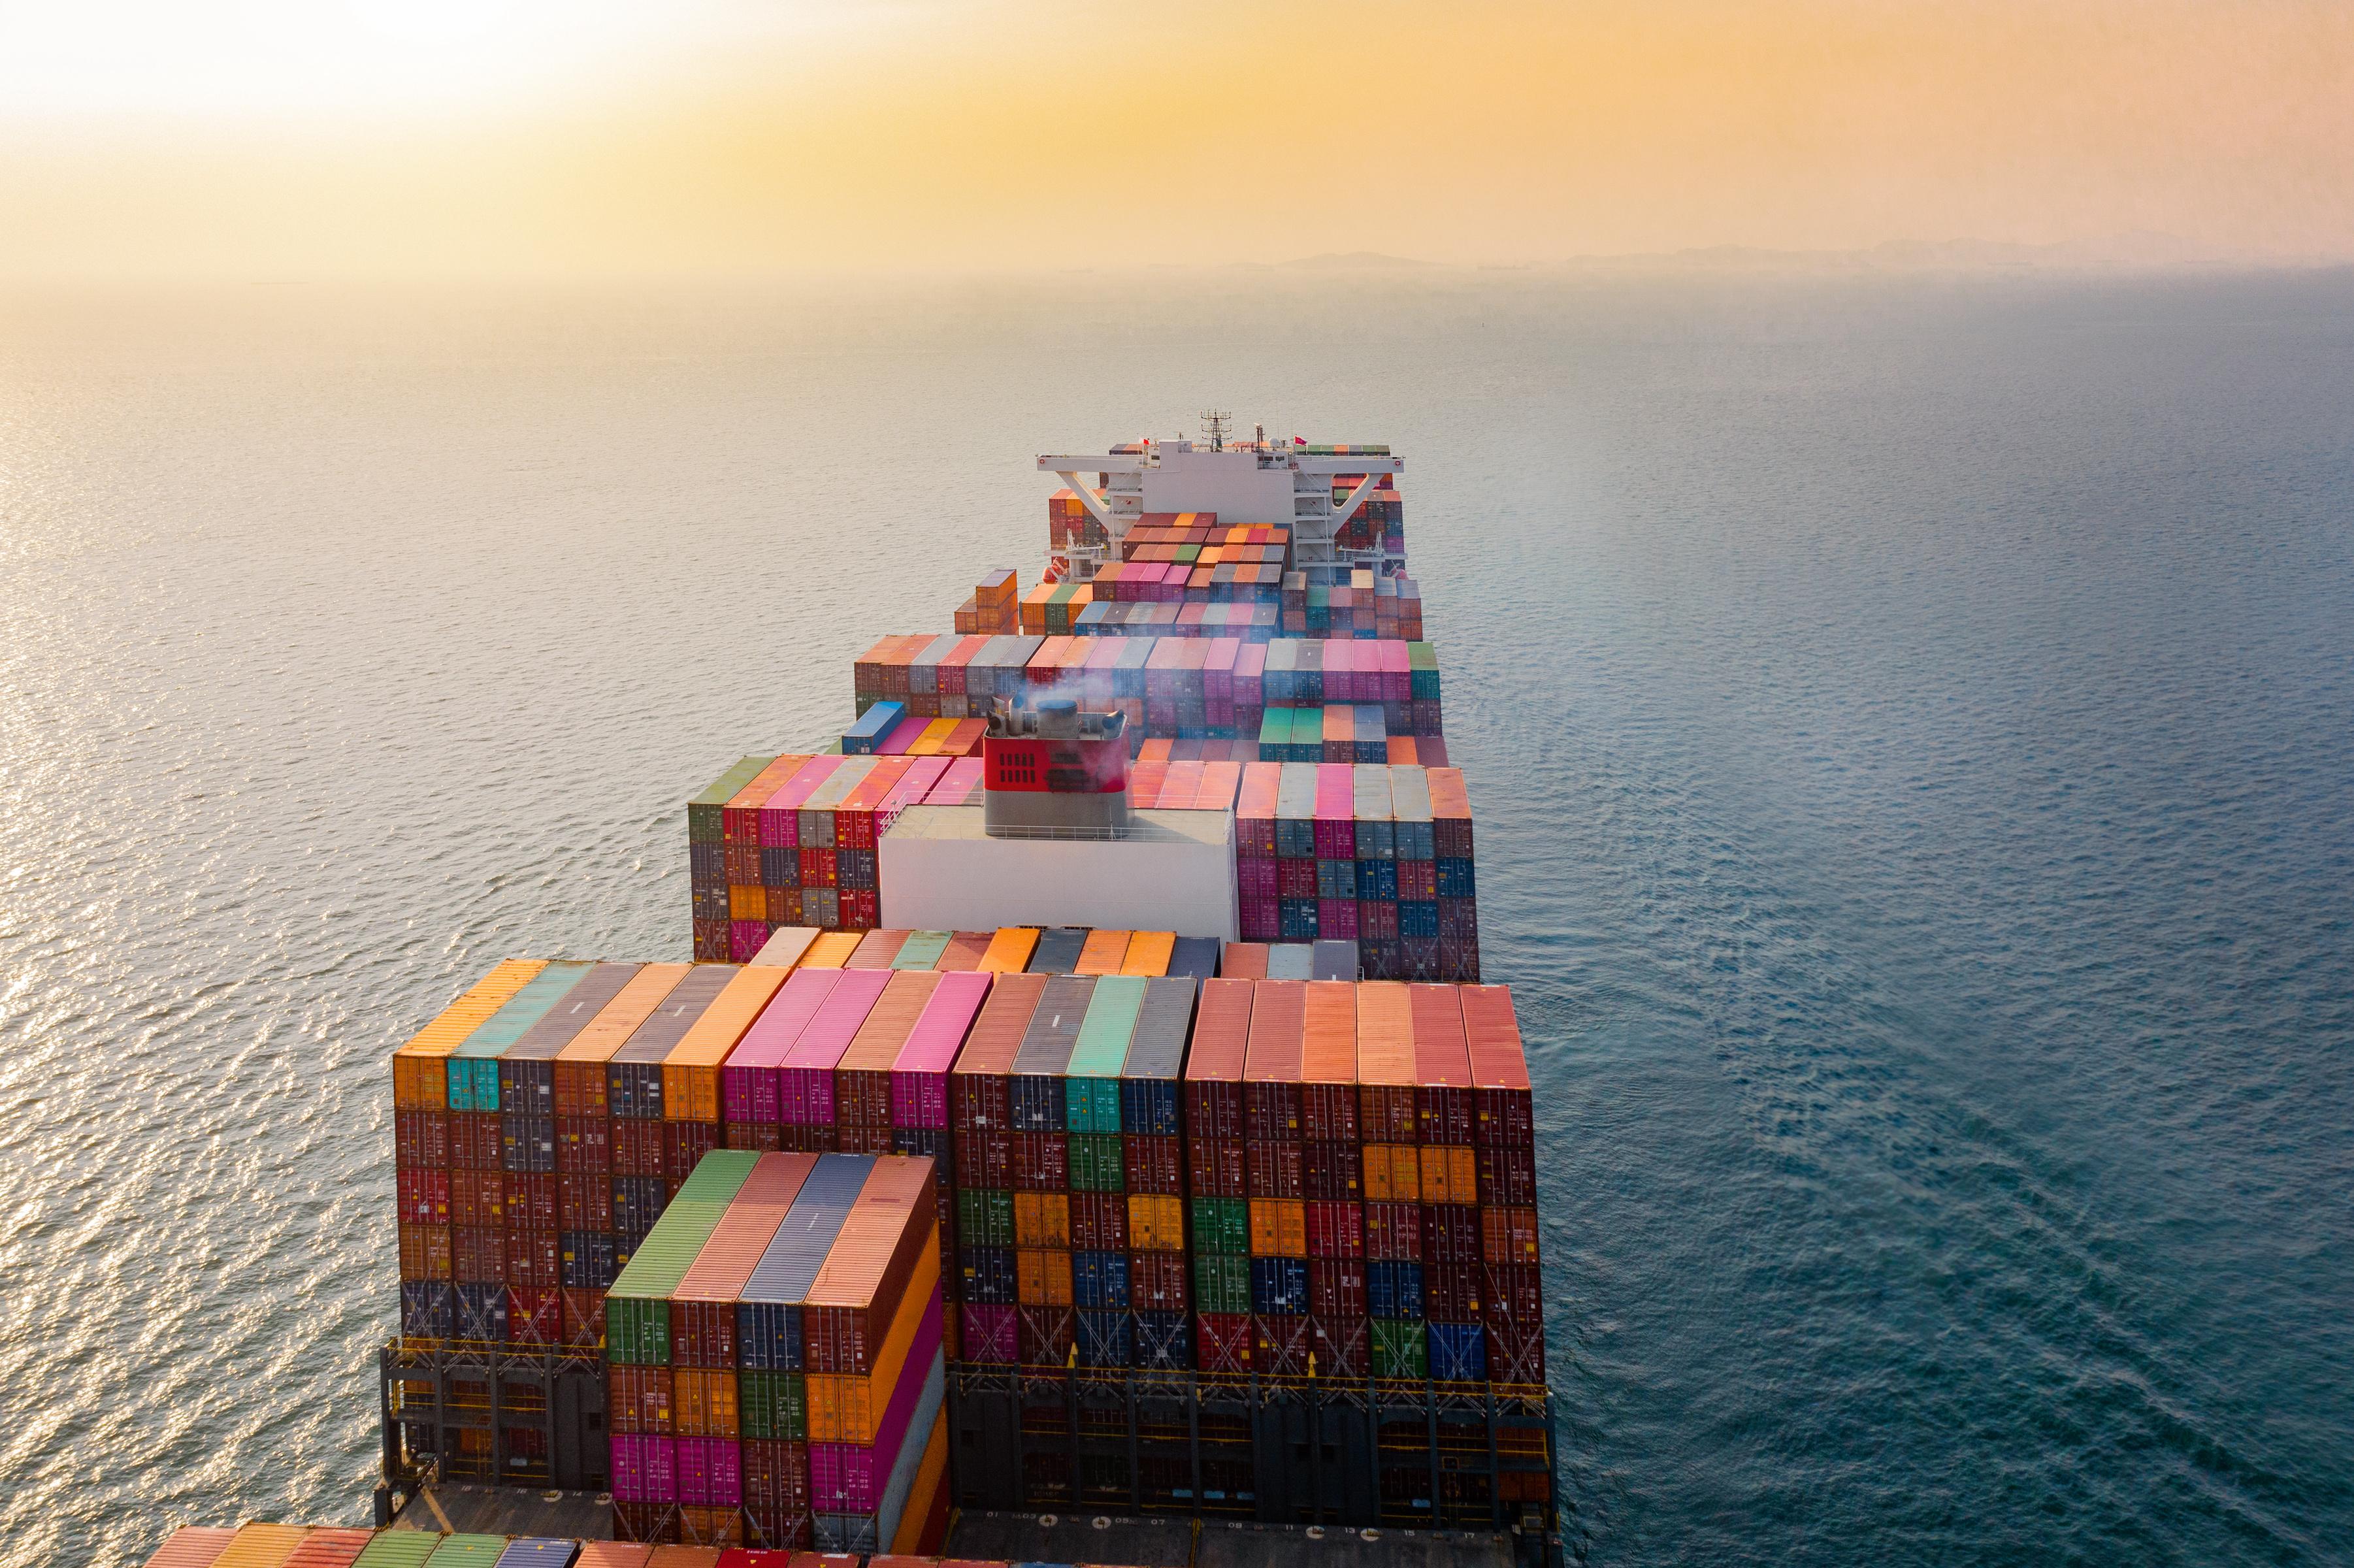 The WACO System (WACO) has appointed award-winning global logistics software as a service company Slync.io as an Associate Vendor Member